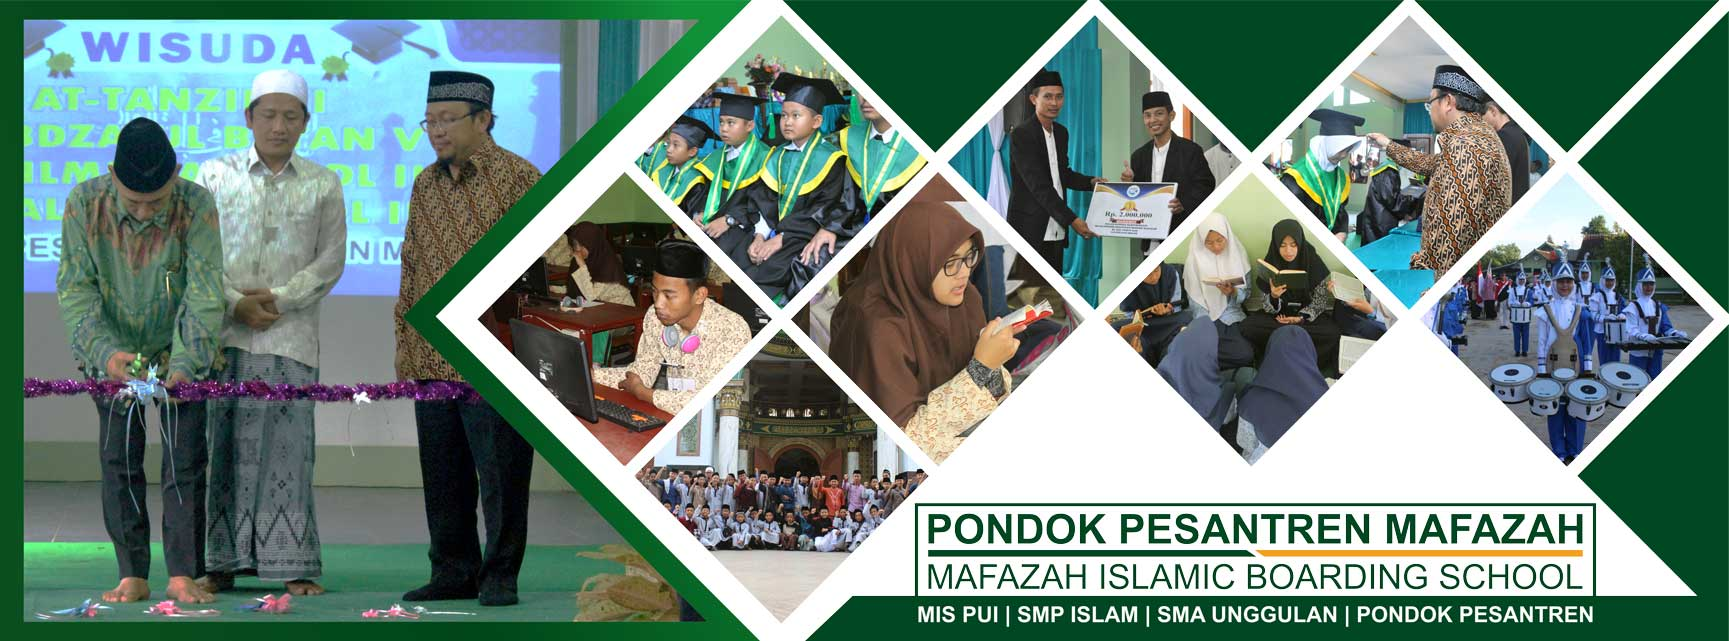 Ponpes Modern MAFAZAH